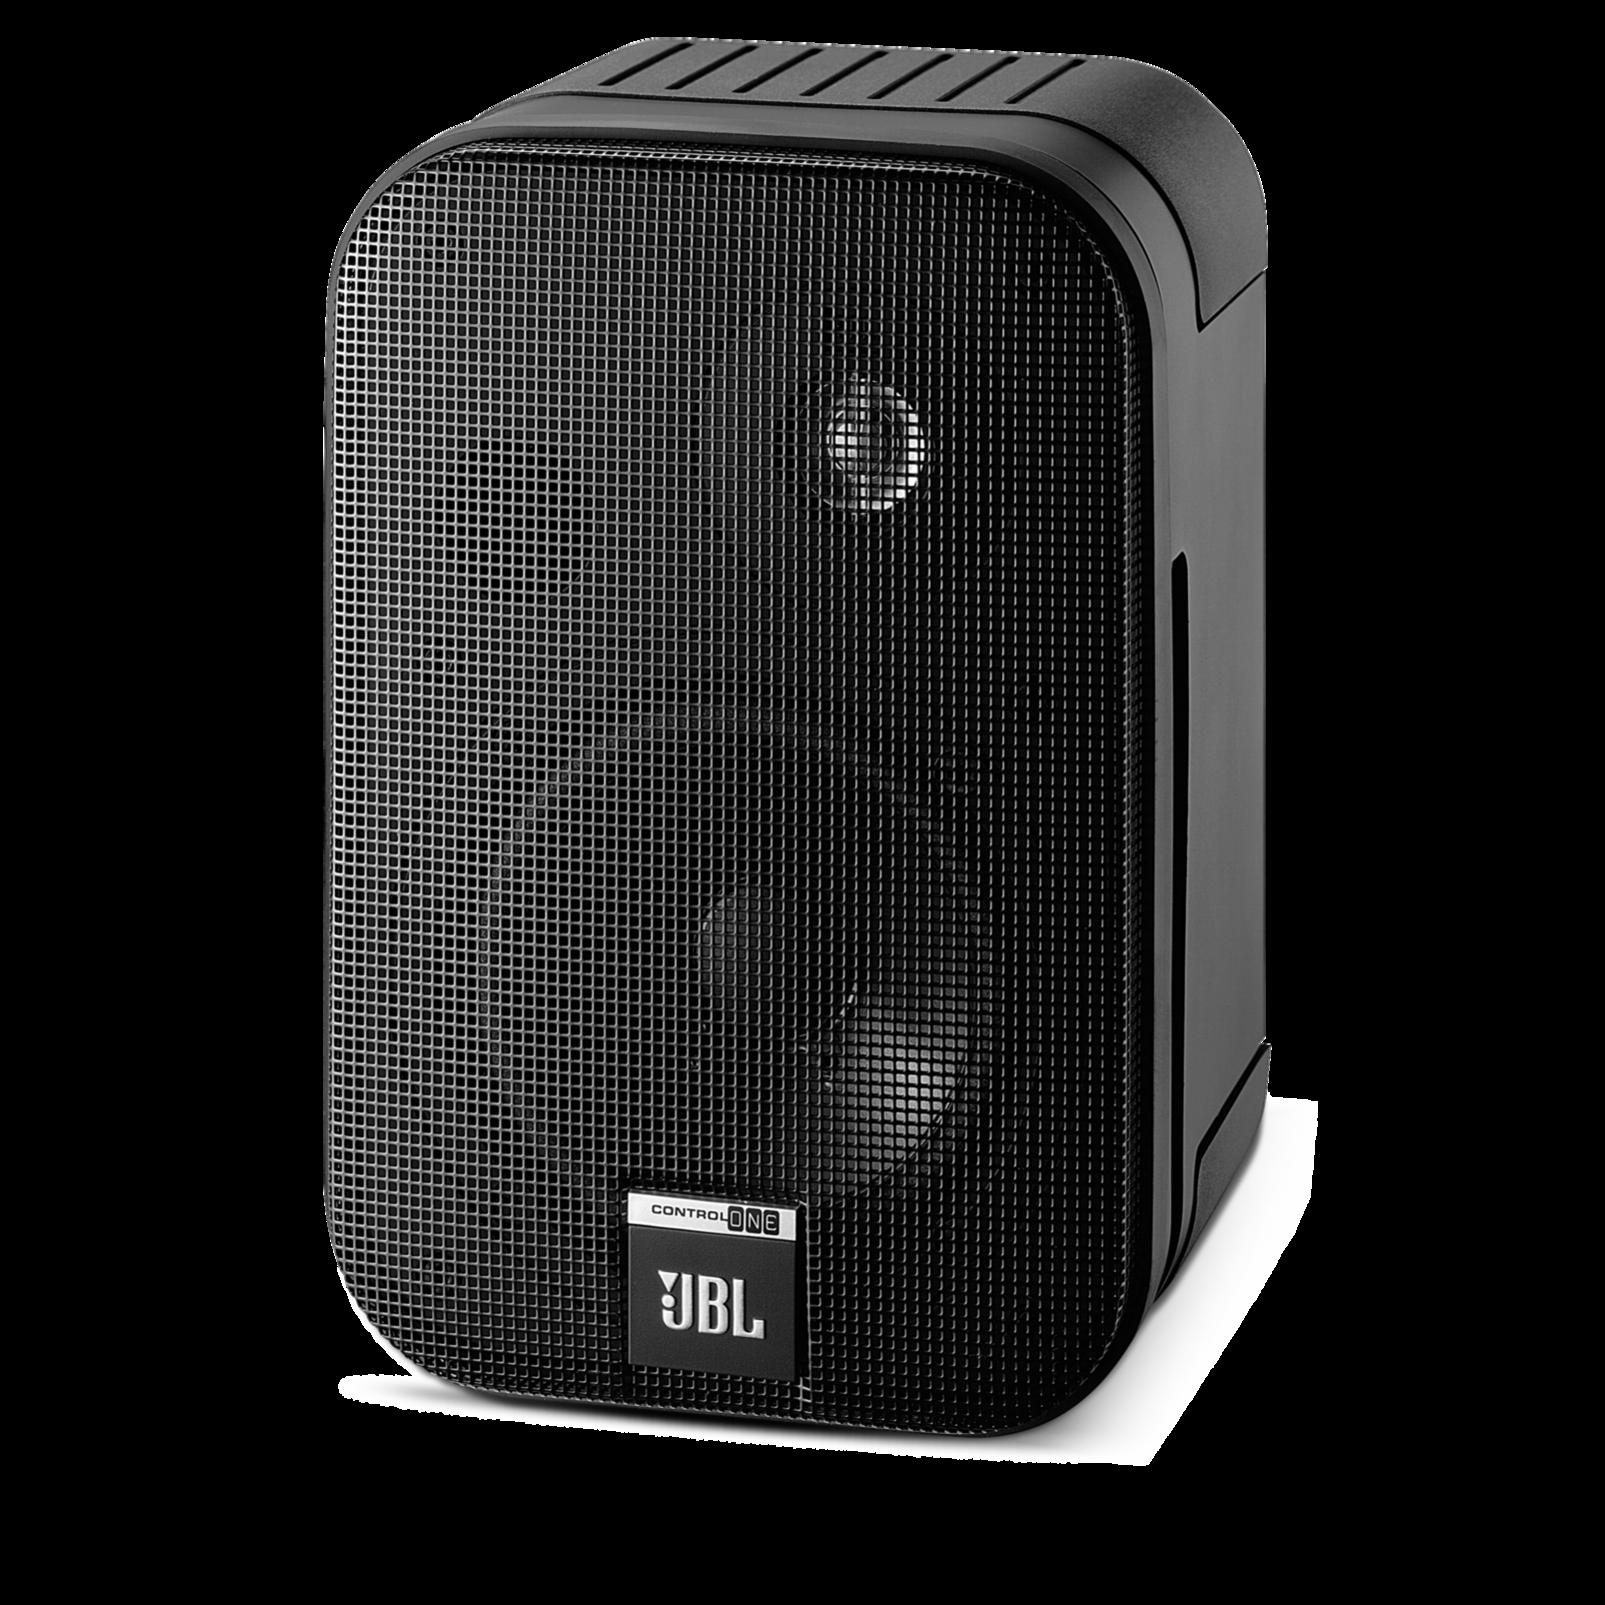 schwarz 2-Wege Lautsprecher 2-Wege Studio Monitor 1A JBL Control ONE 1 SCS